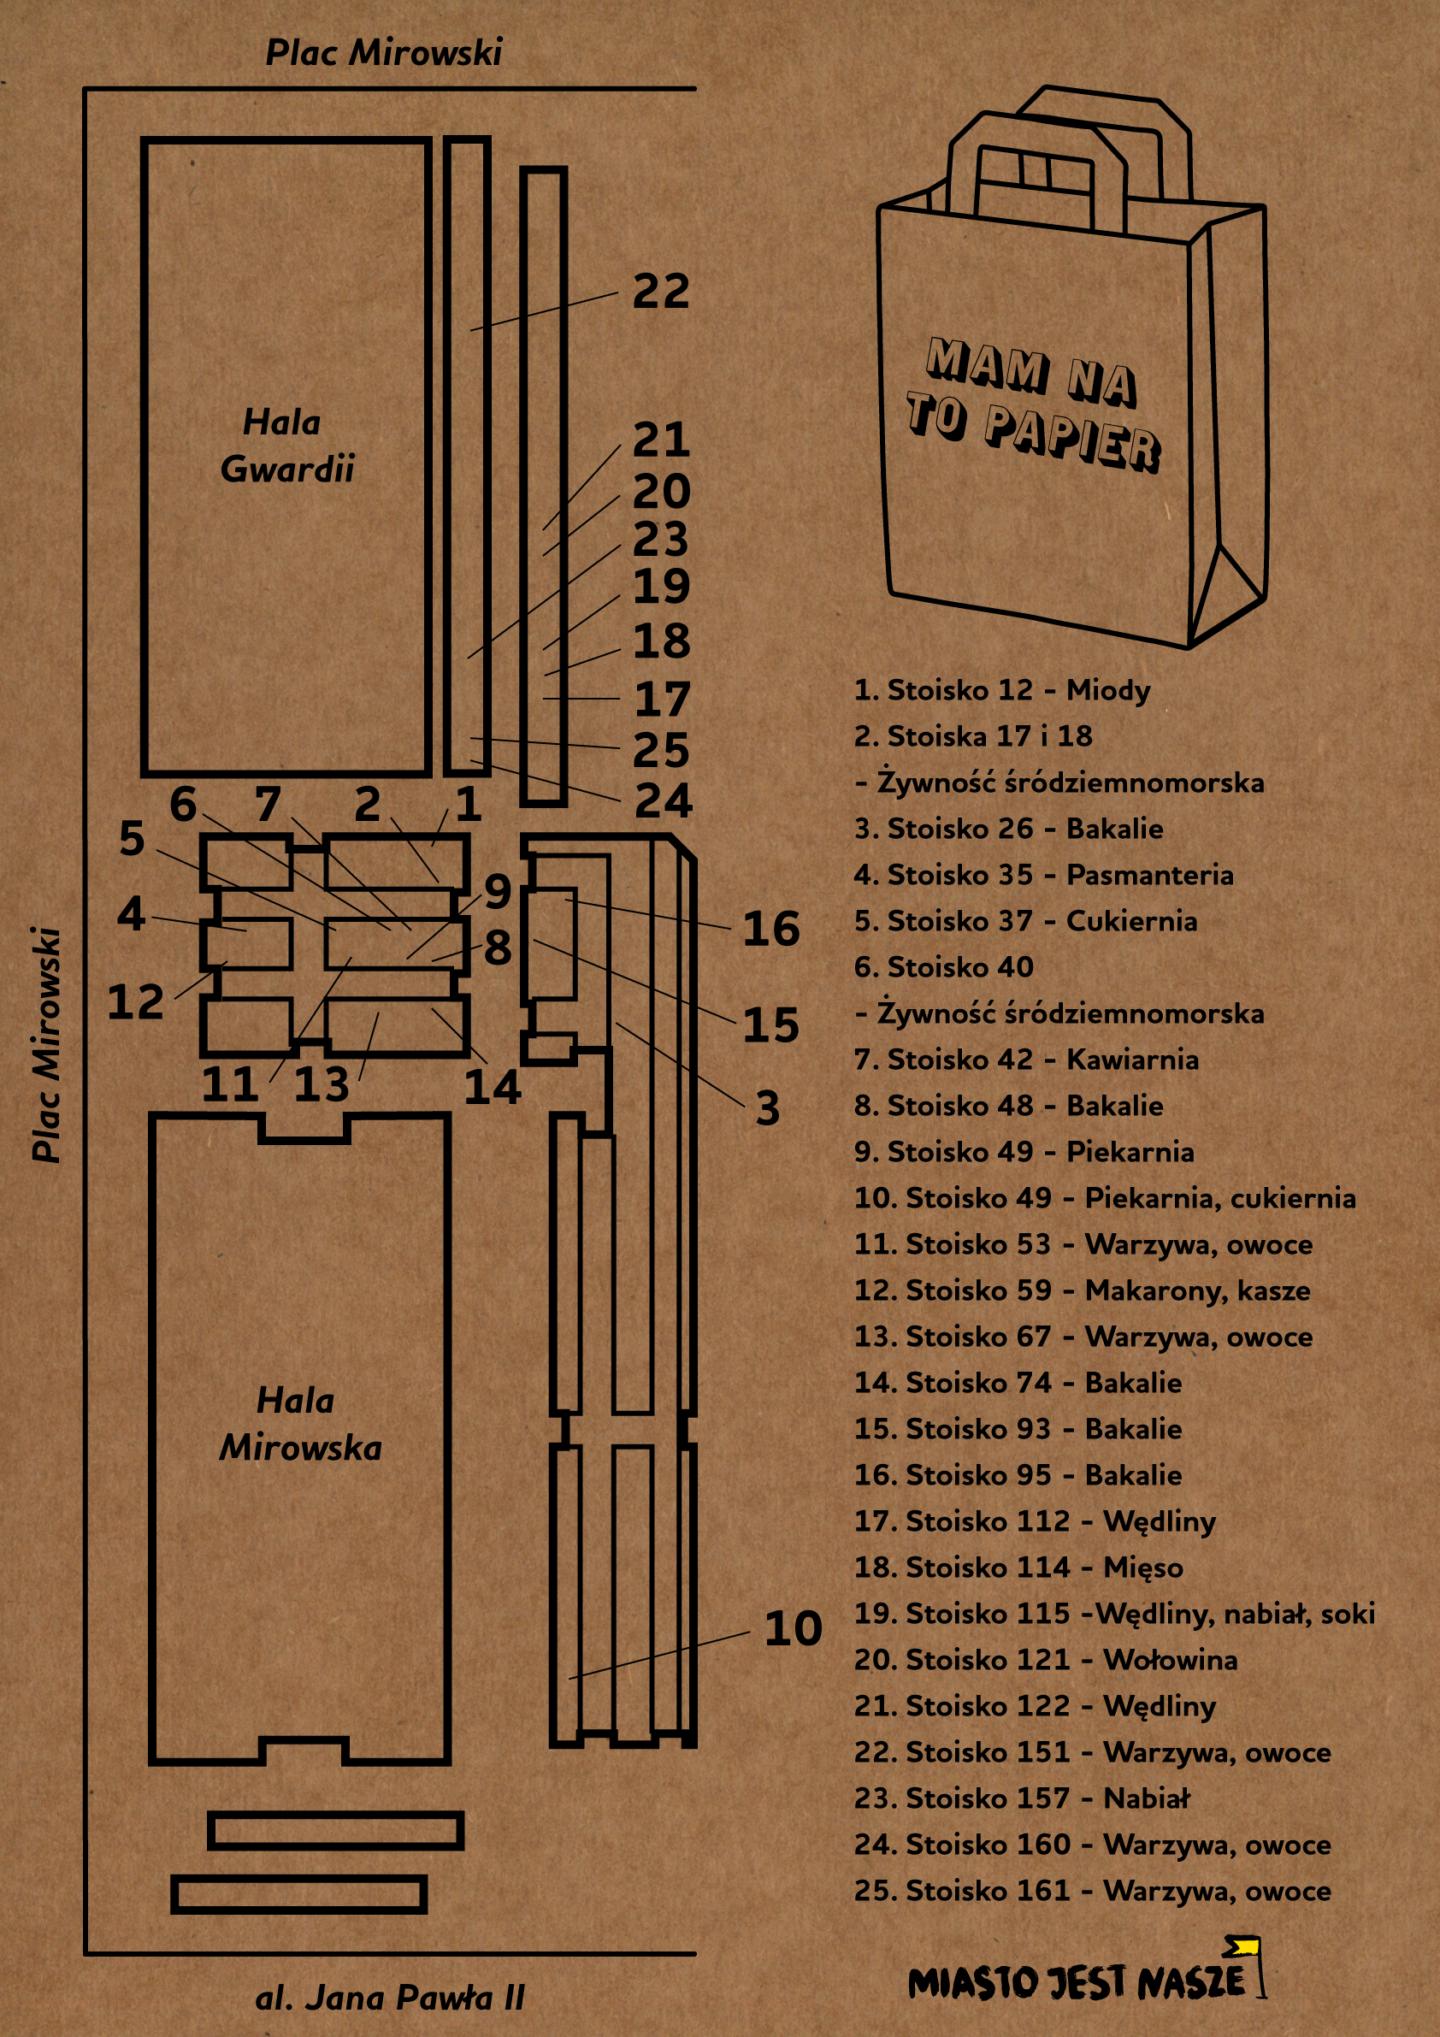 Mapa Mam NaToPapier